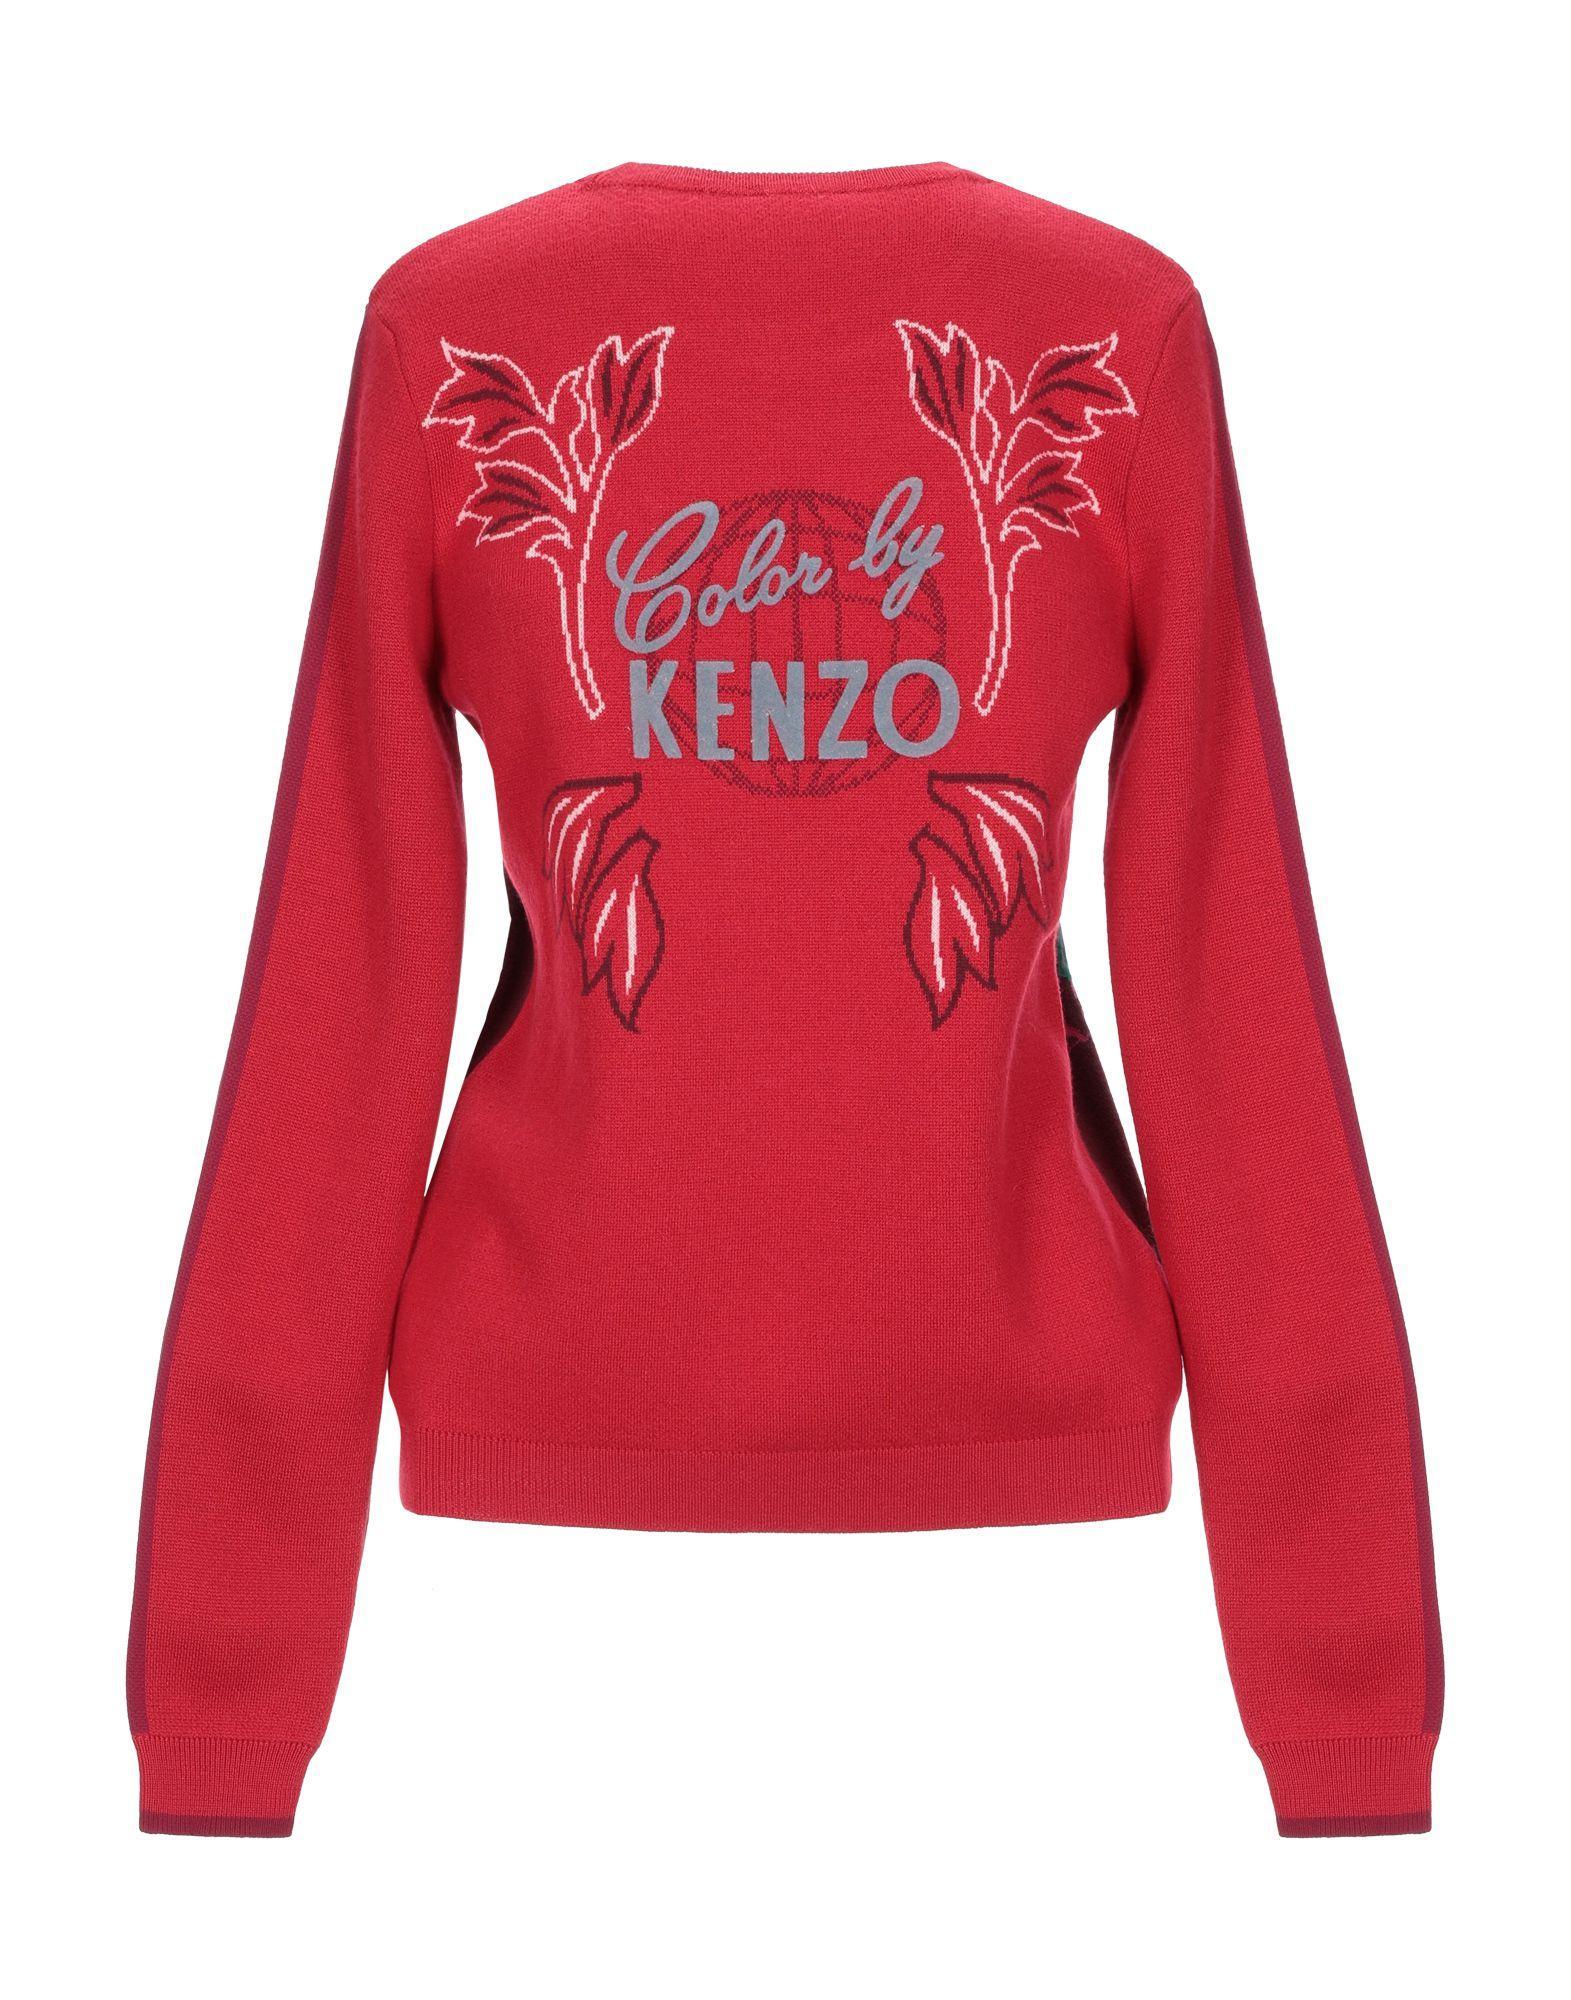 Pull Femme Laines KENZO en coloris Rouge